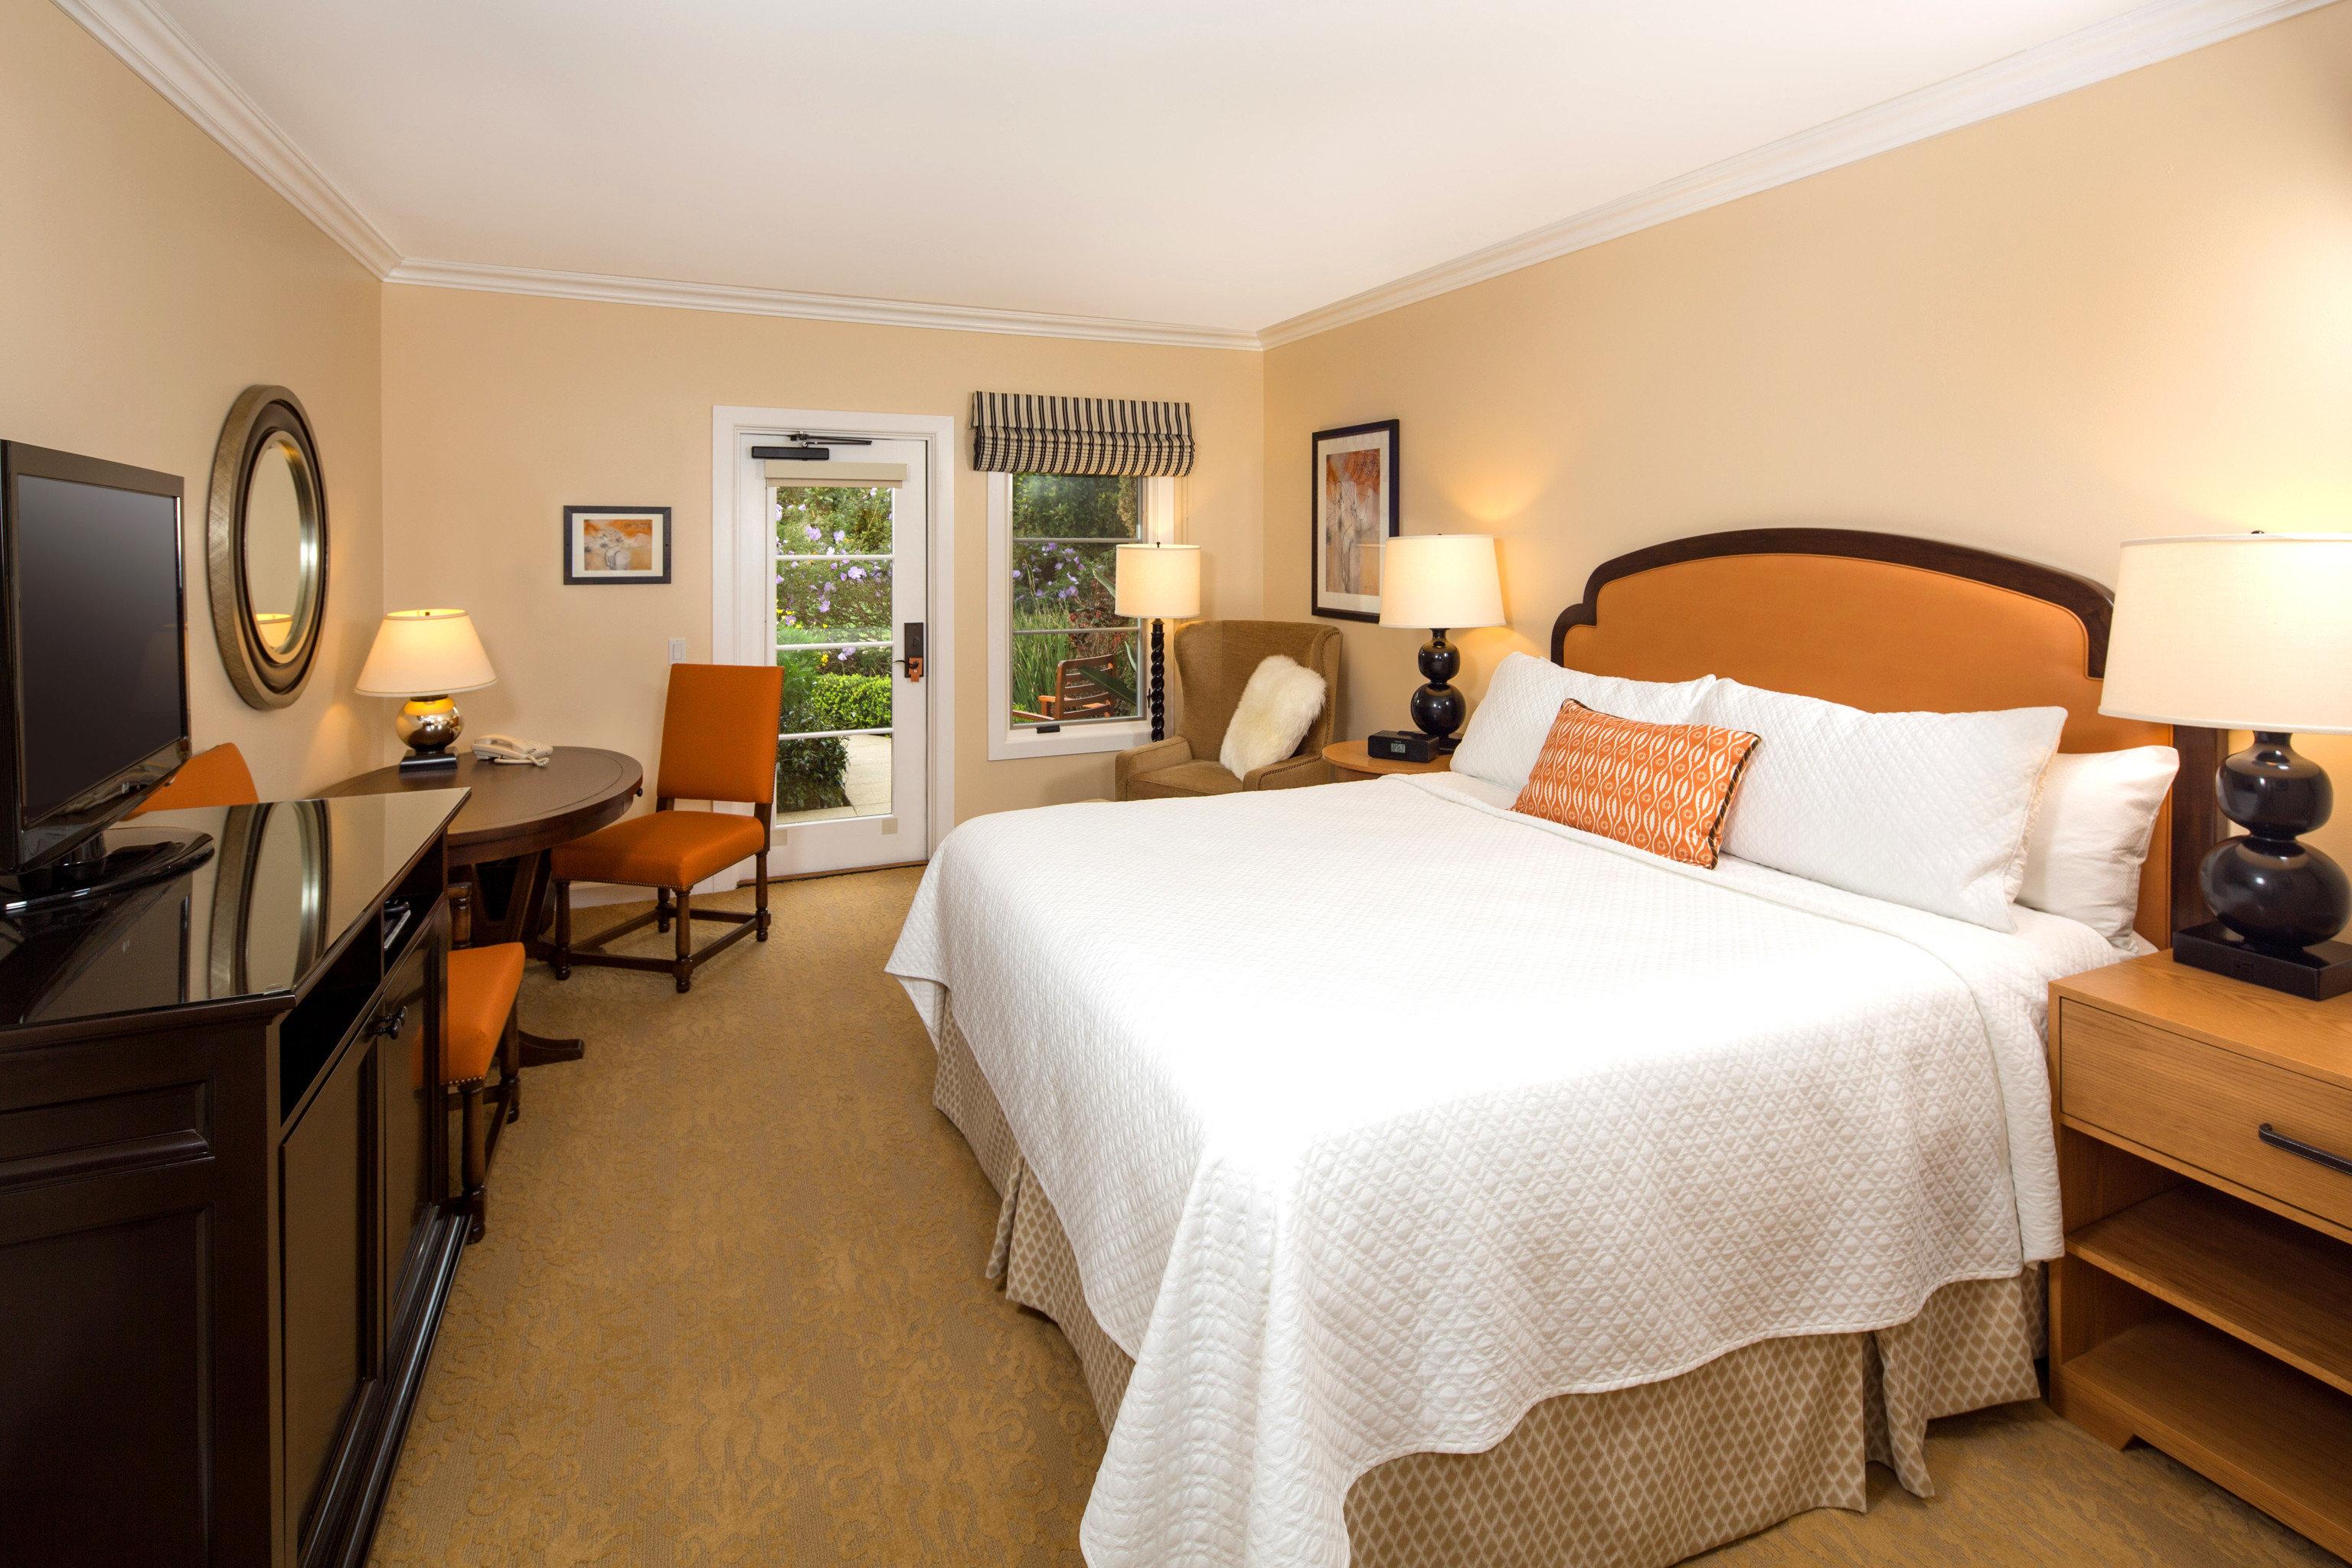 Bedroom Hotels Resort indoor wall floor bed ceiling room hotel property Suite real estate cottage estate apartment furniture tan